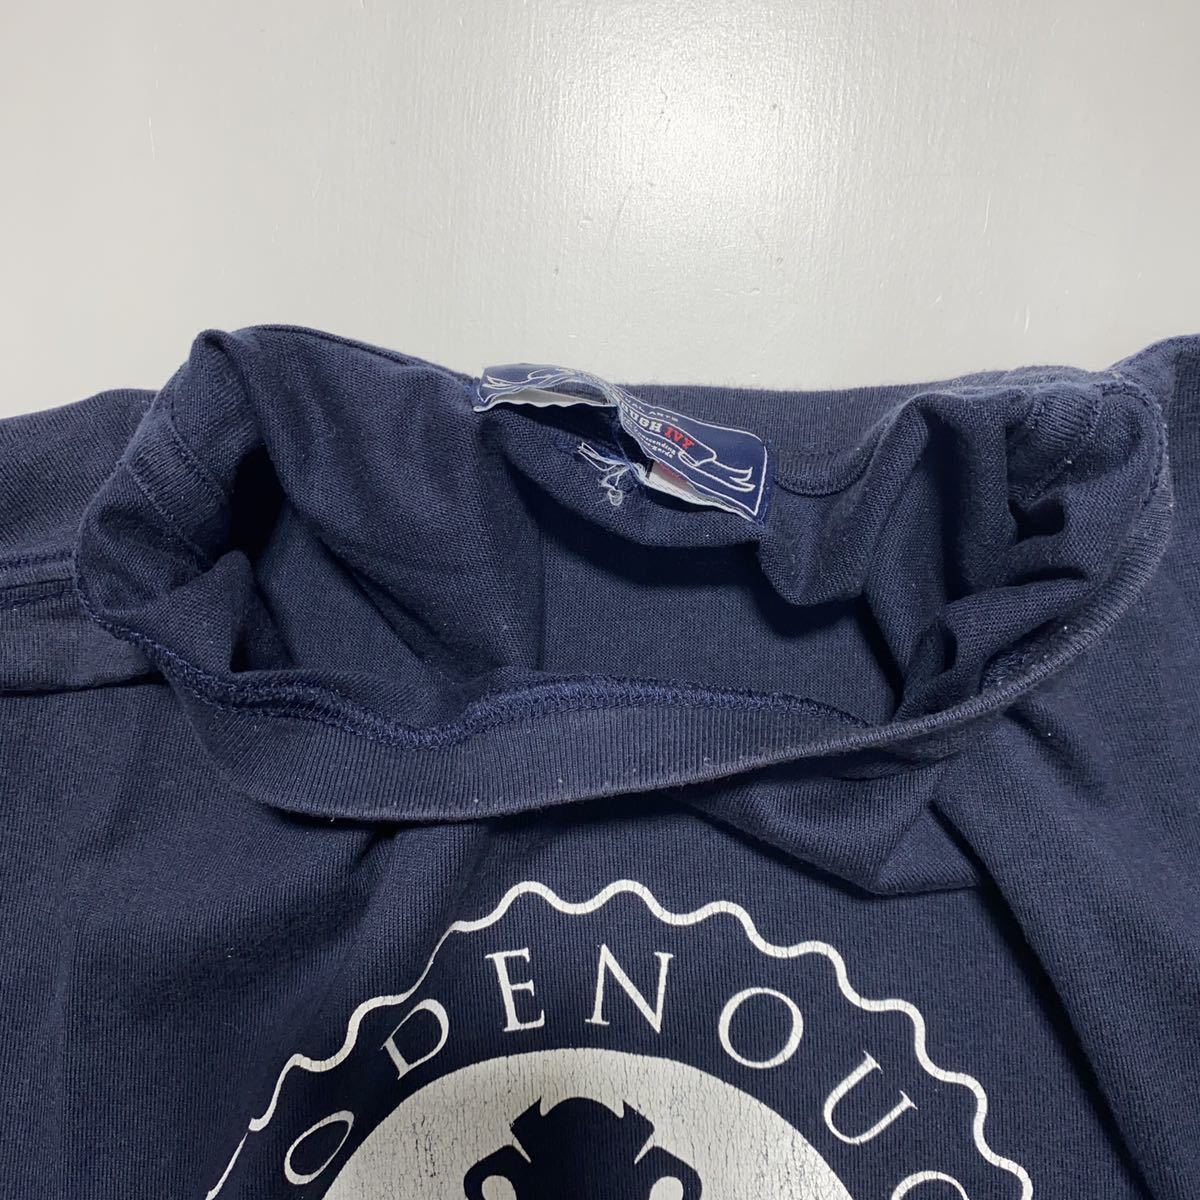 【M】GOODENOUGH IVY FRAGMENT DESIGN CIRCLE LOGO TEE グッドイナフ フラグメントデザイン アイビー サークル ロゴ Tシャツ G478_画像4